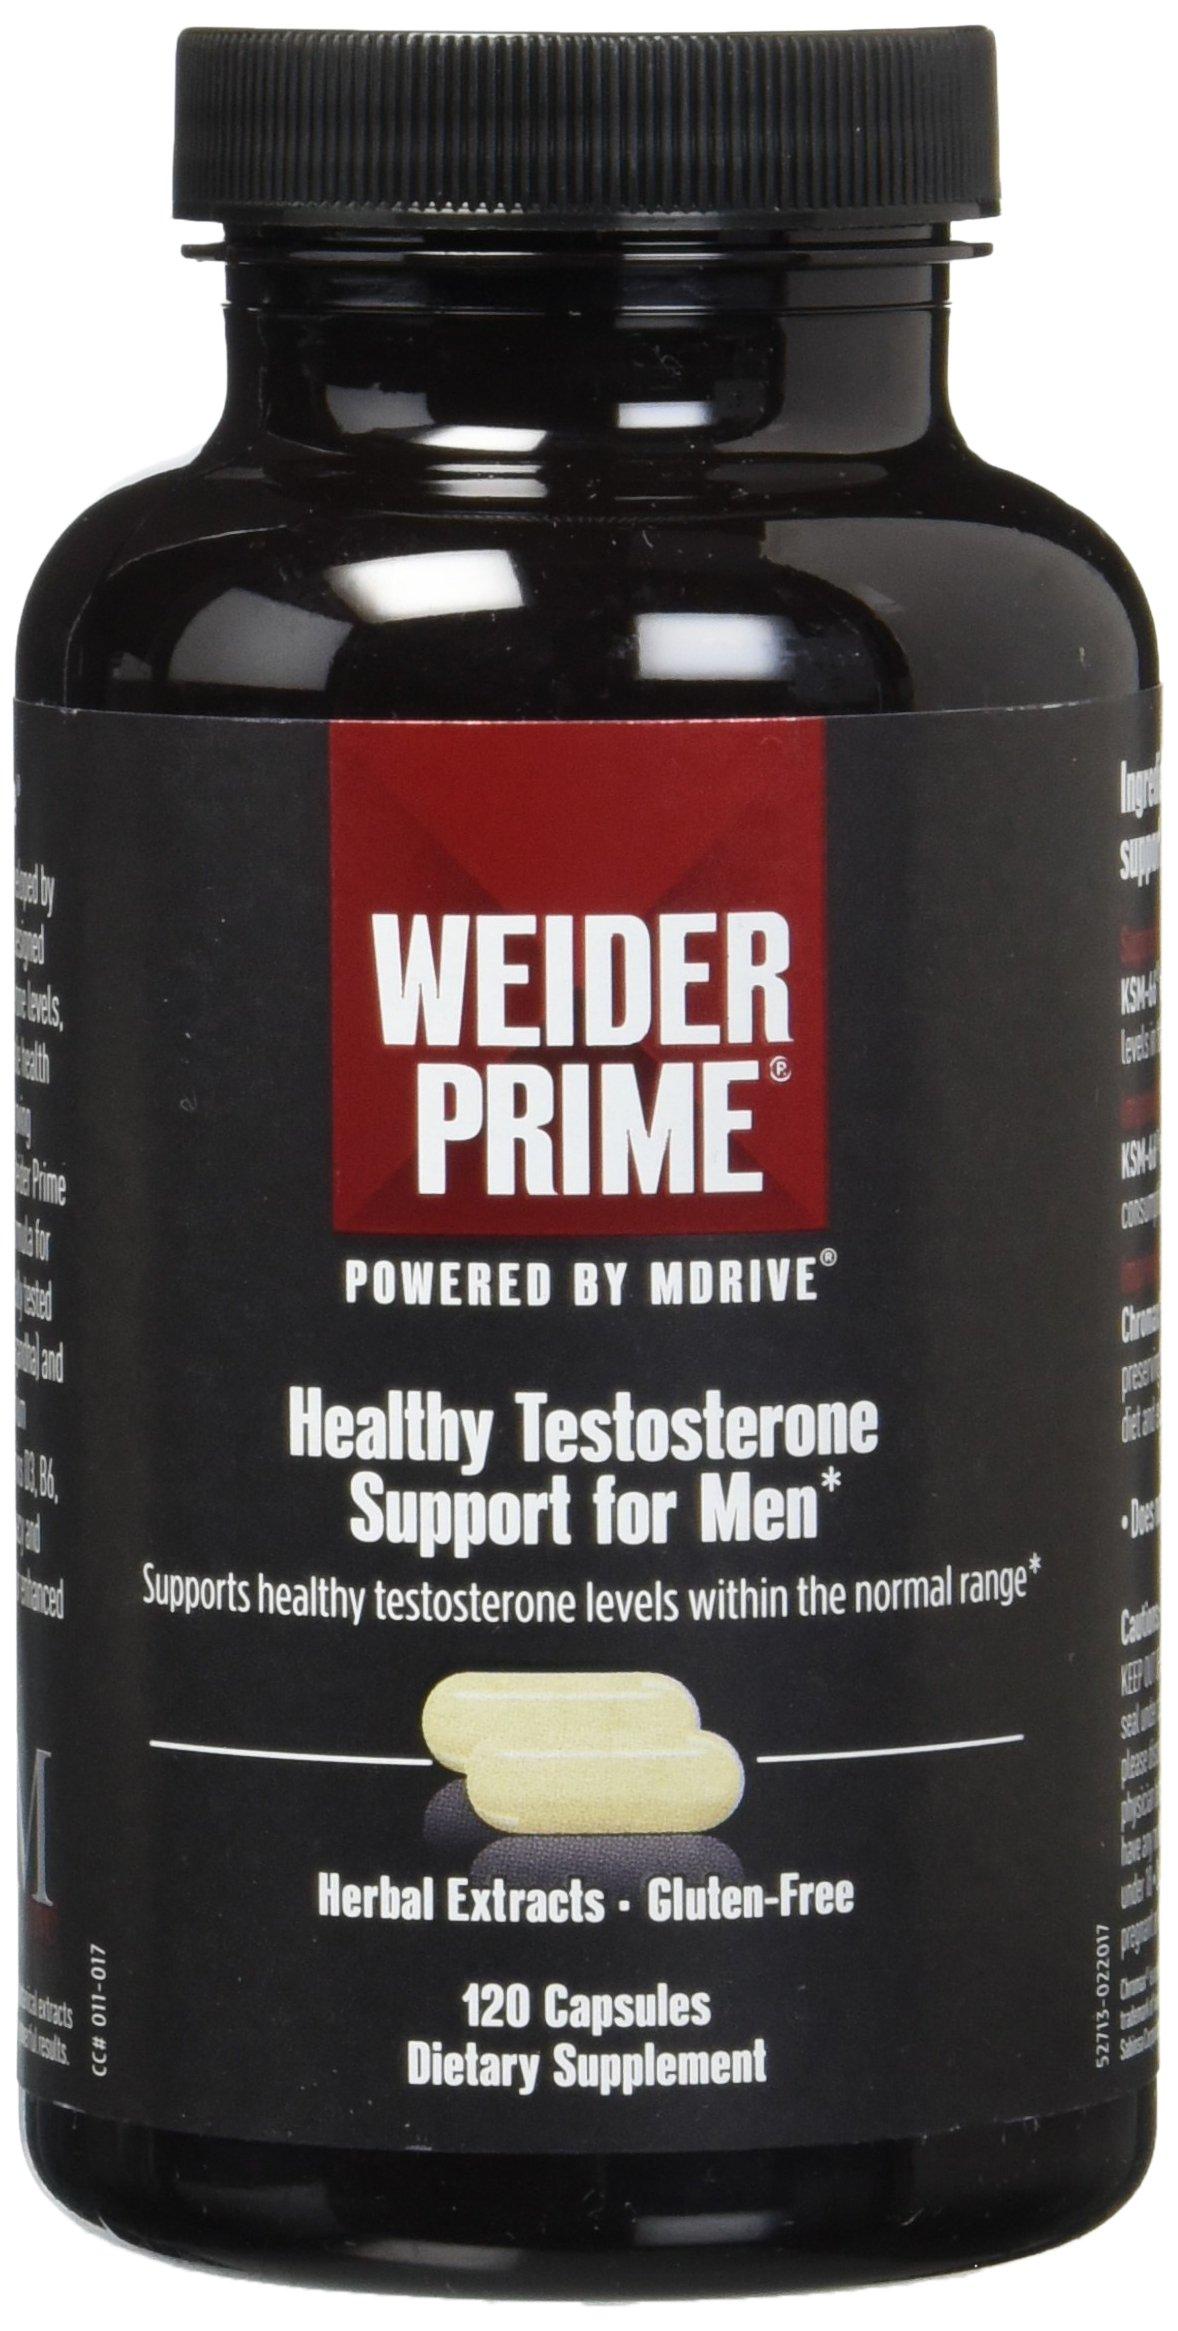 Weider Prime Low T Support - KSM 66 Ashwagandha - Improve Energy- Improve Lean Body Mass- Improve cardiorespiratory endurance - 2 Month Supply